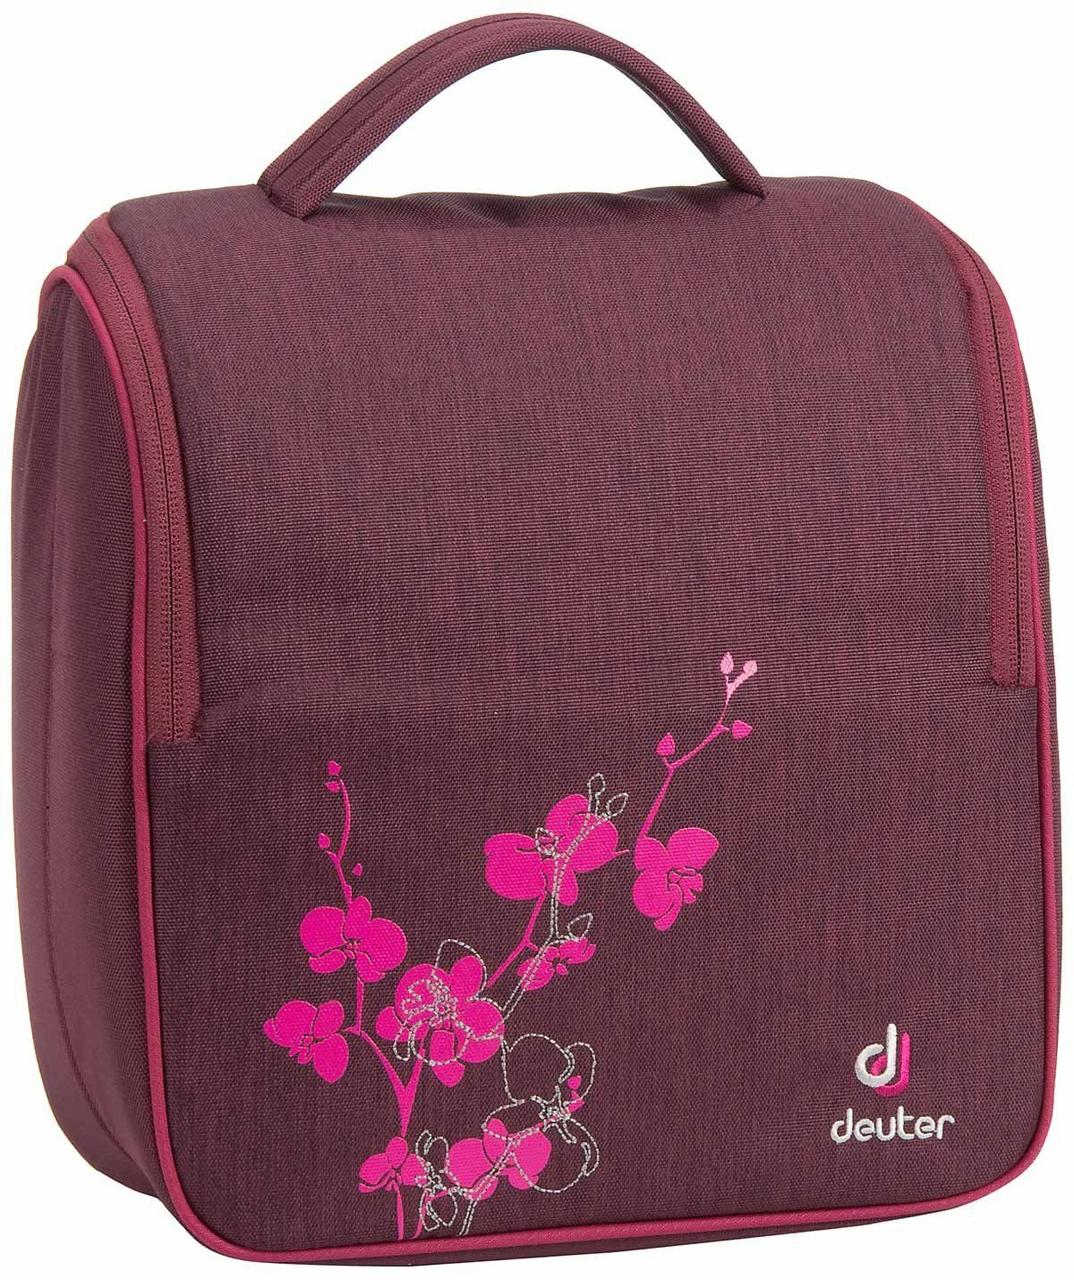 Несессер Deuter Wash Room blackberry-dresscode (39474 5032)